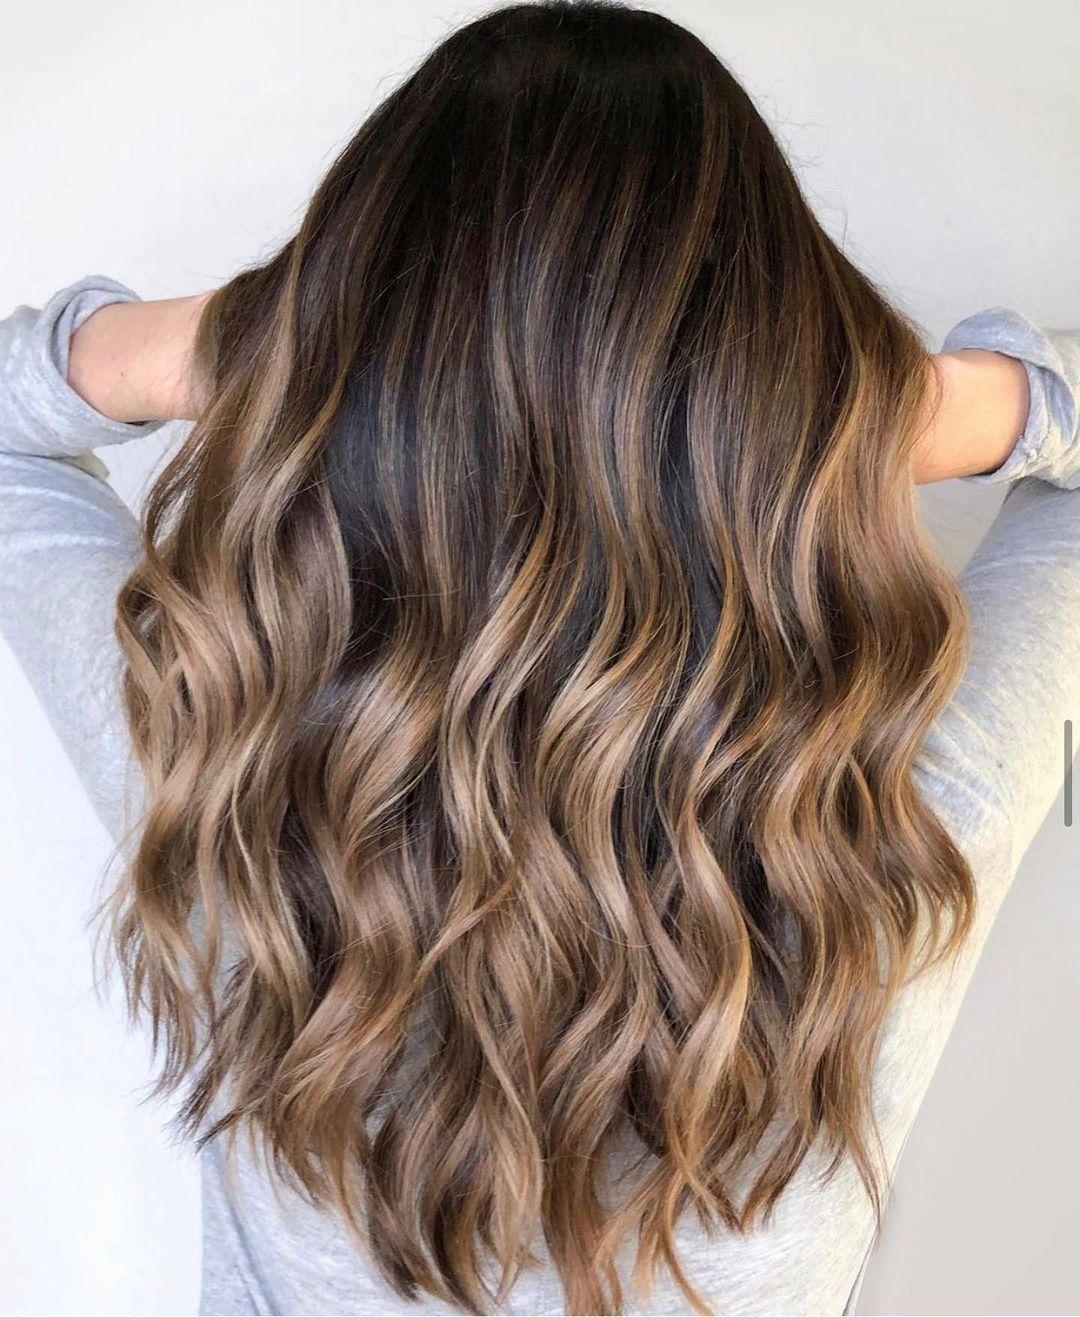 Sweet Honey Highlights for Dark Wavy Hair